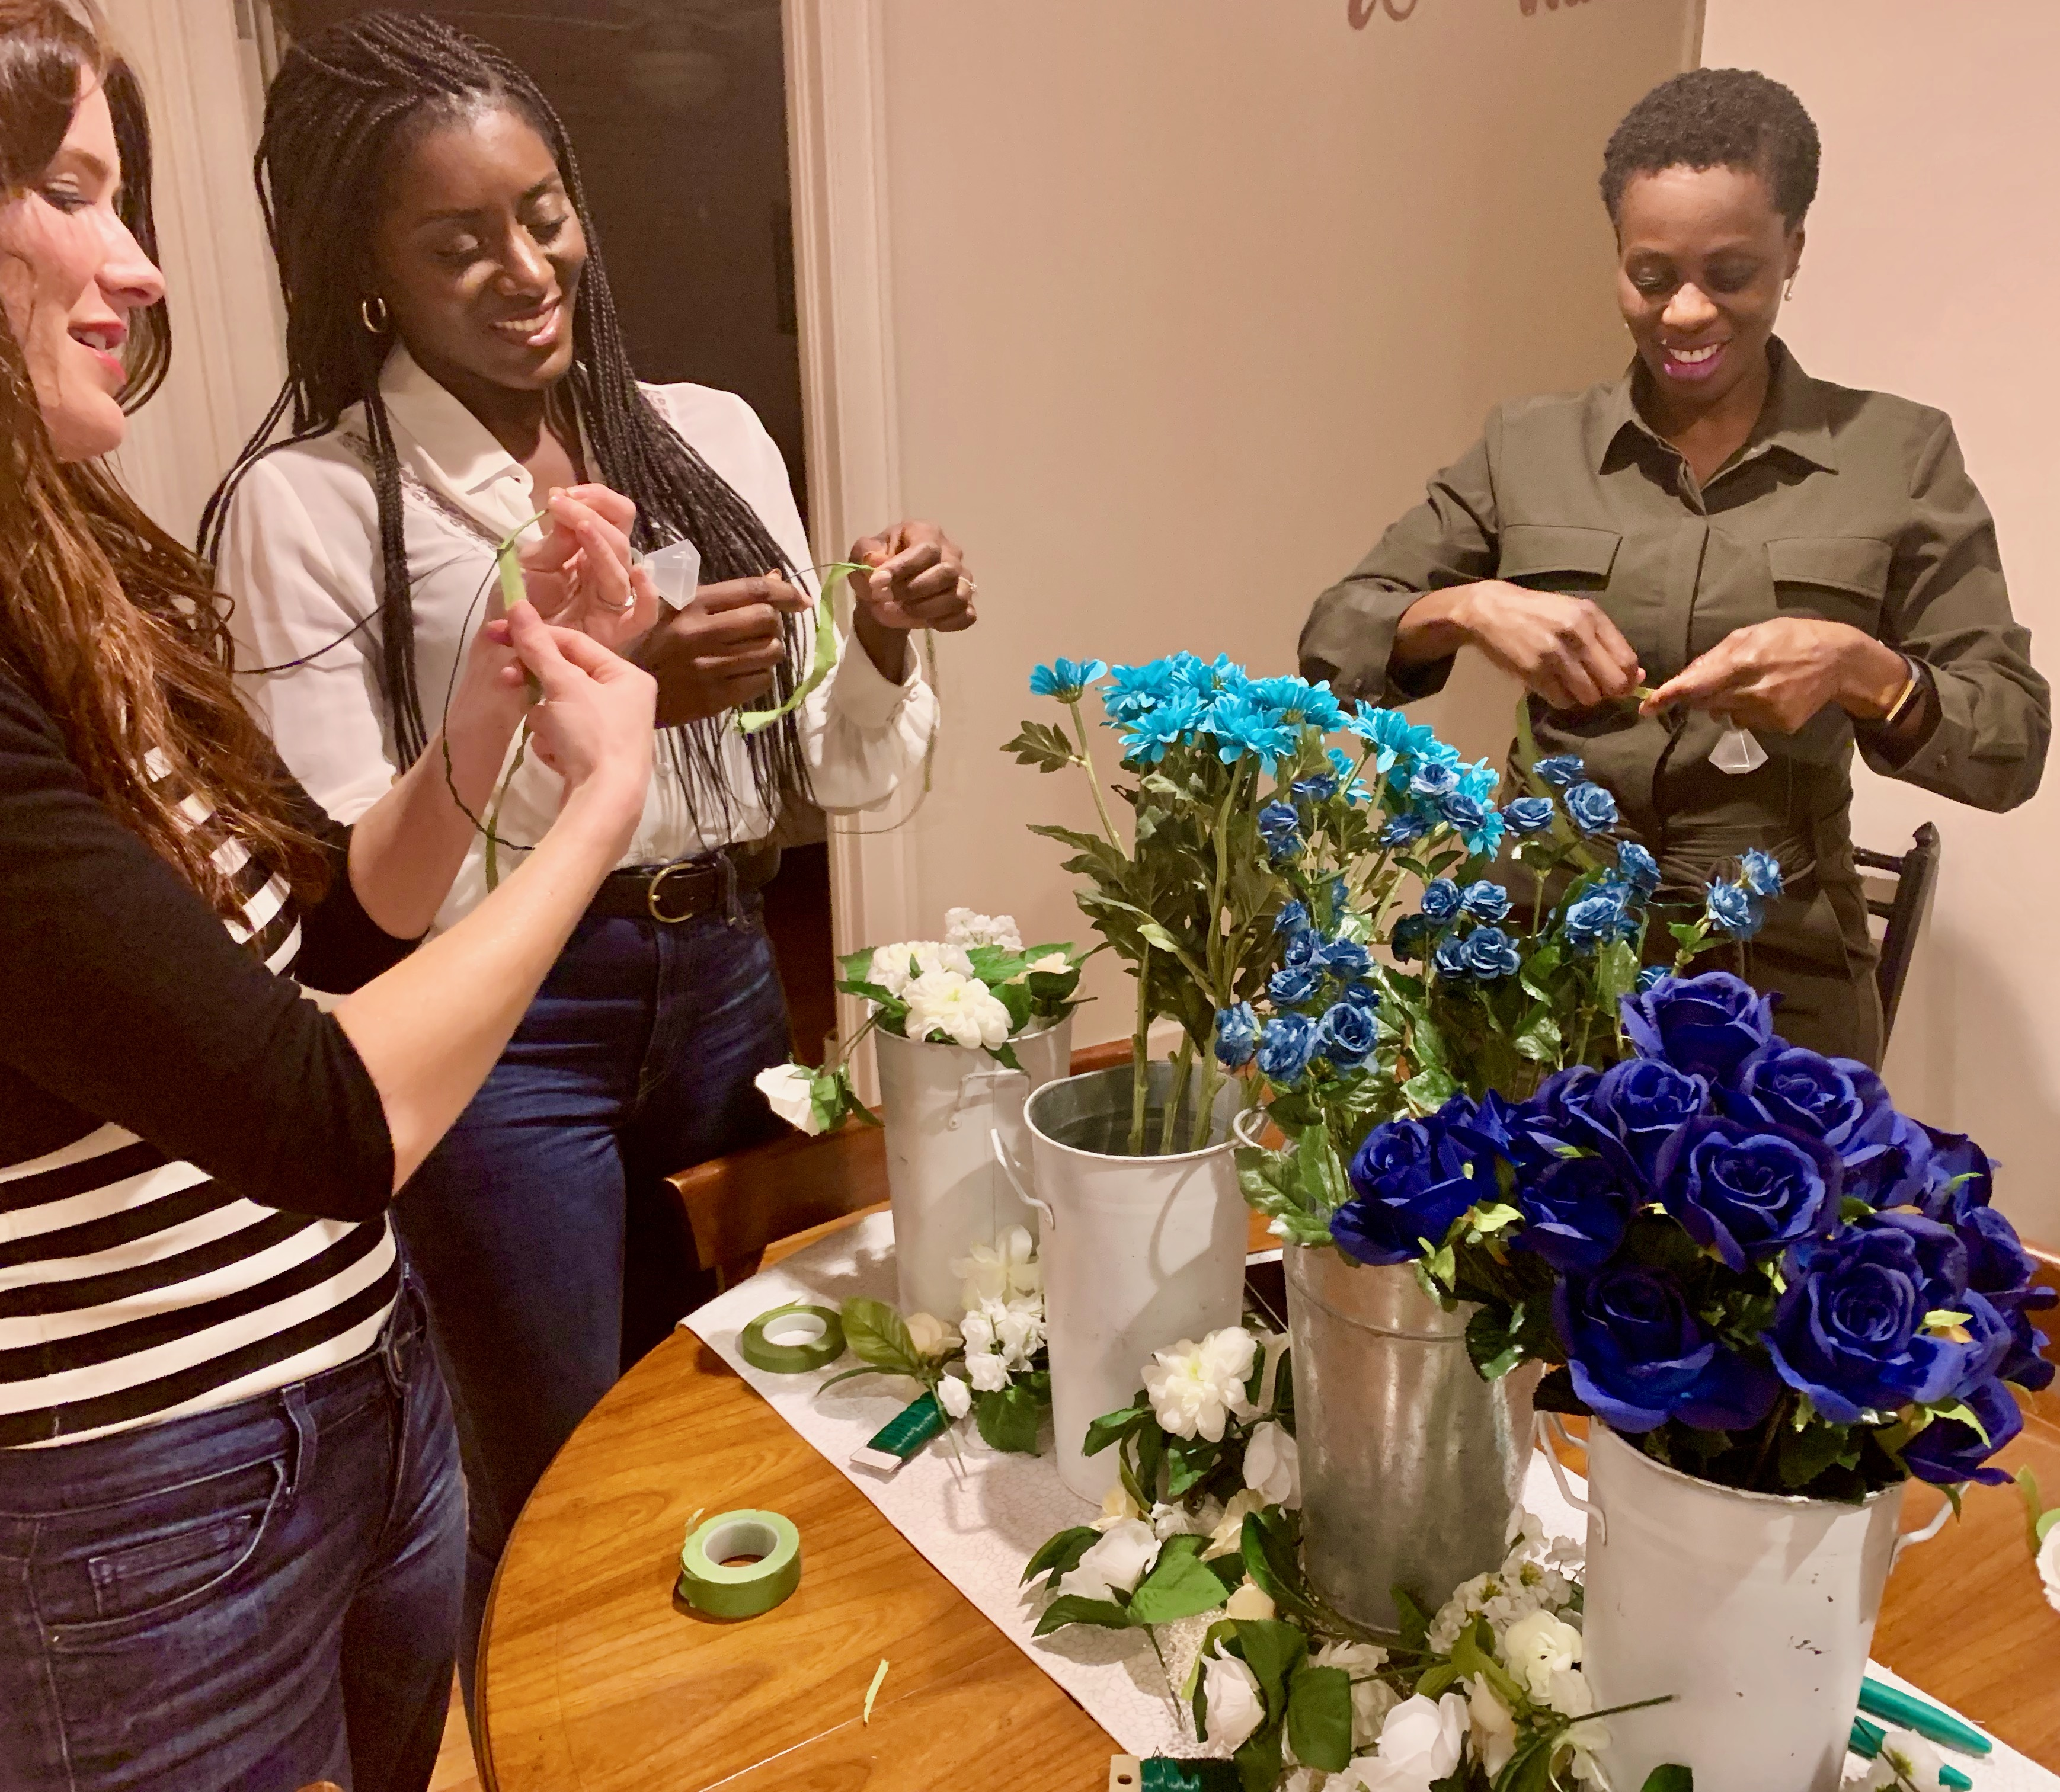 flower crown workshop for a bachelorette party